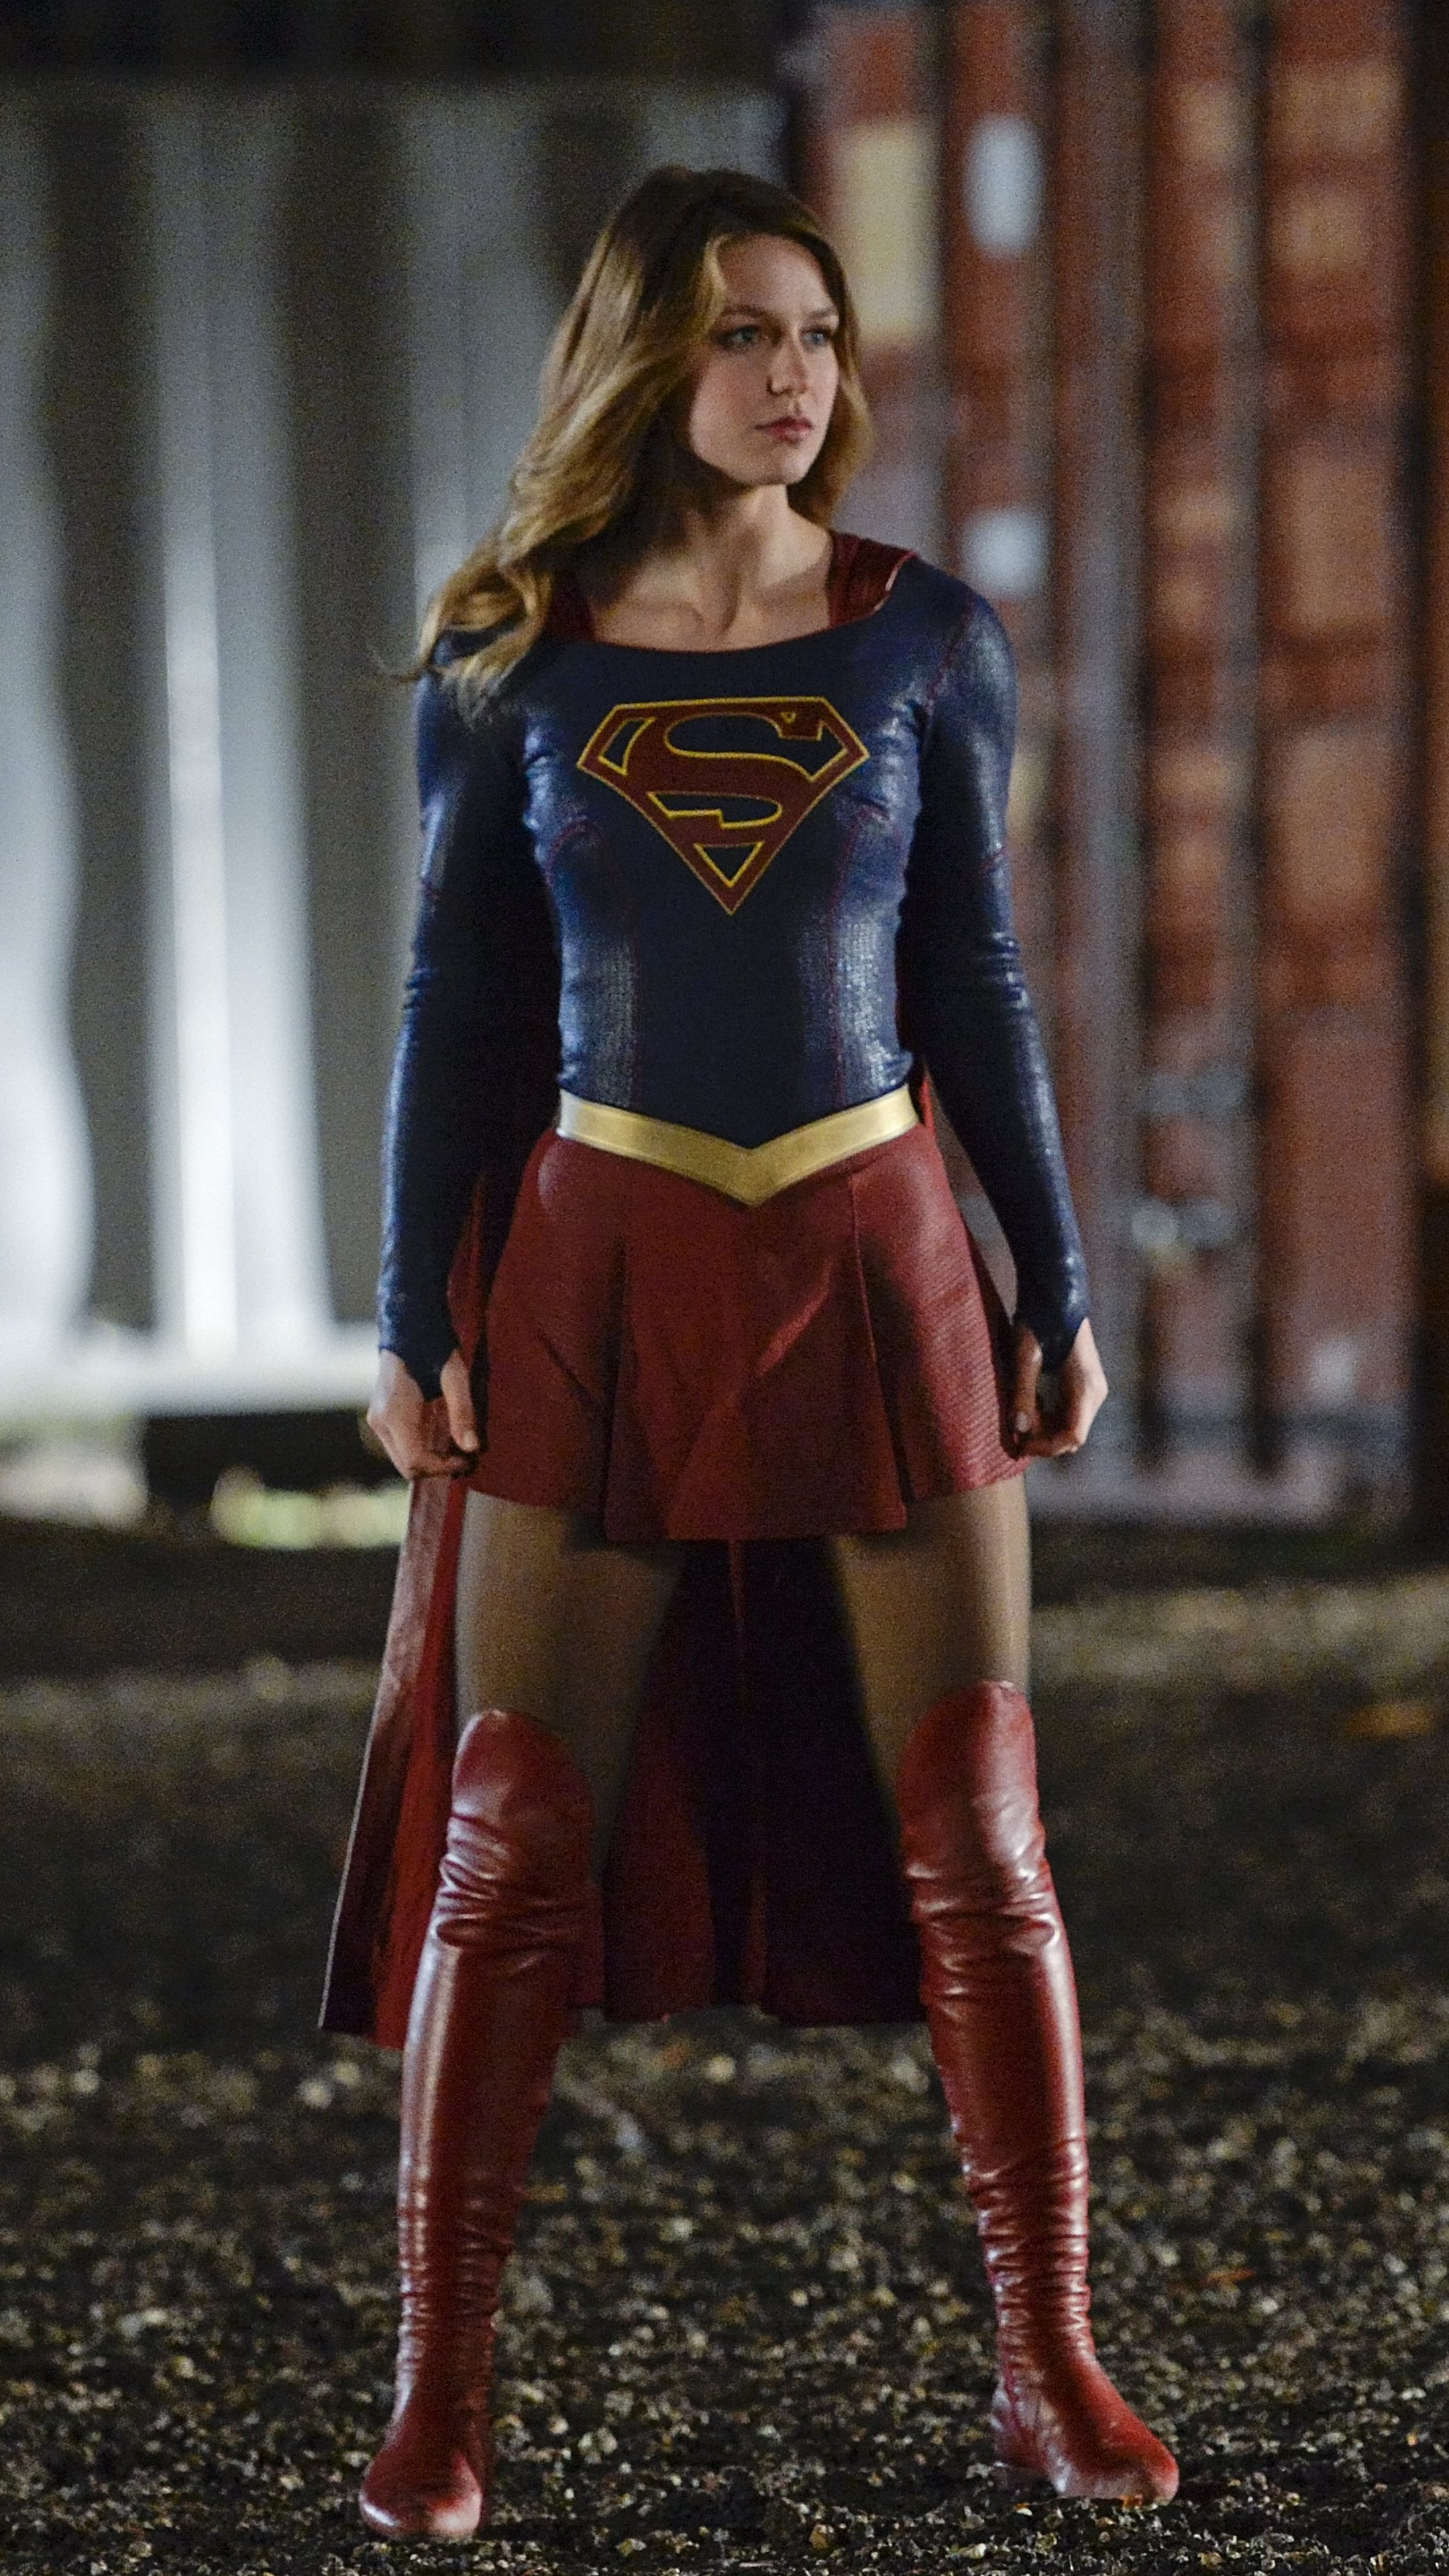 1080x1920 3d Wallpaper 2160x3840 Supergirl Season 3 2018 Sony Xperia X Xz Z5